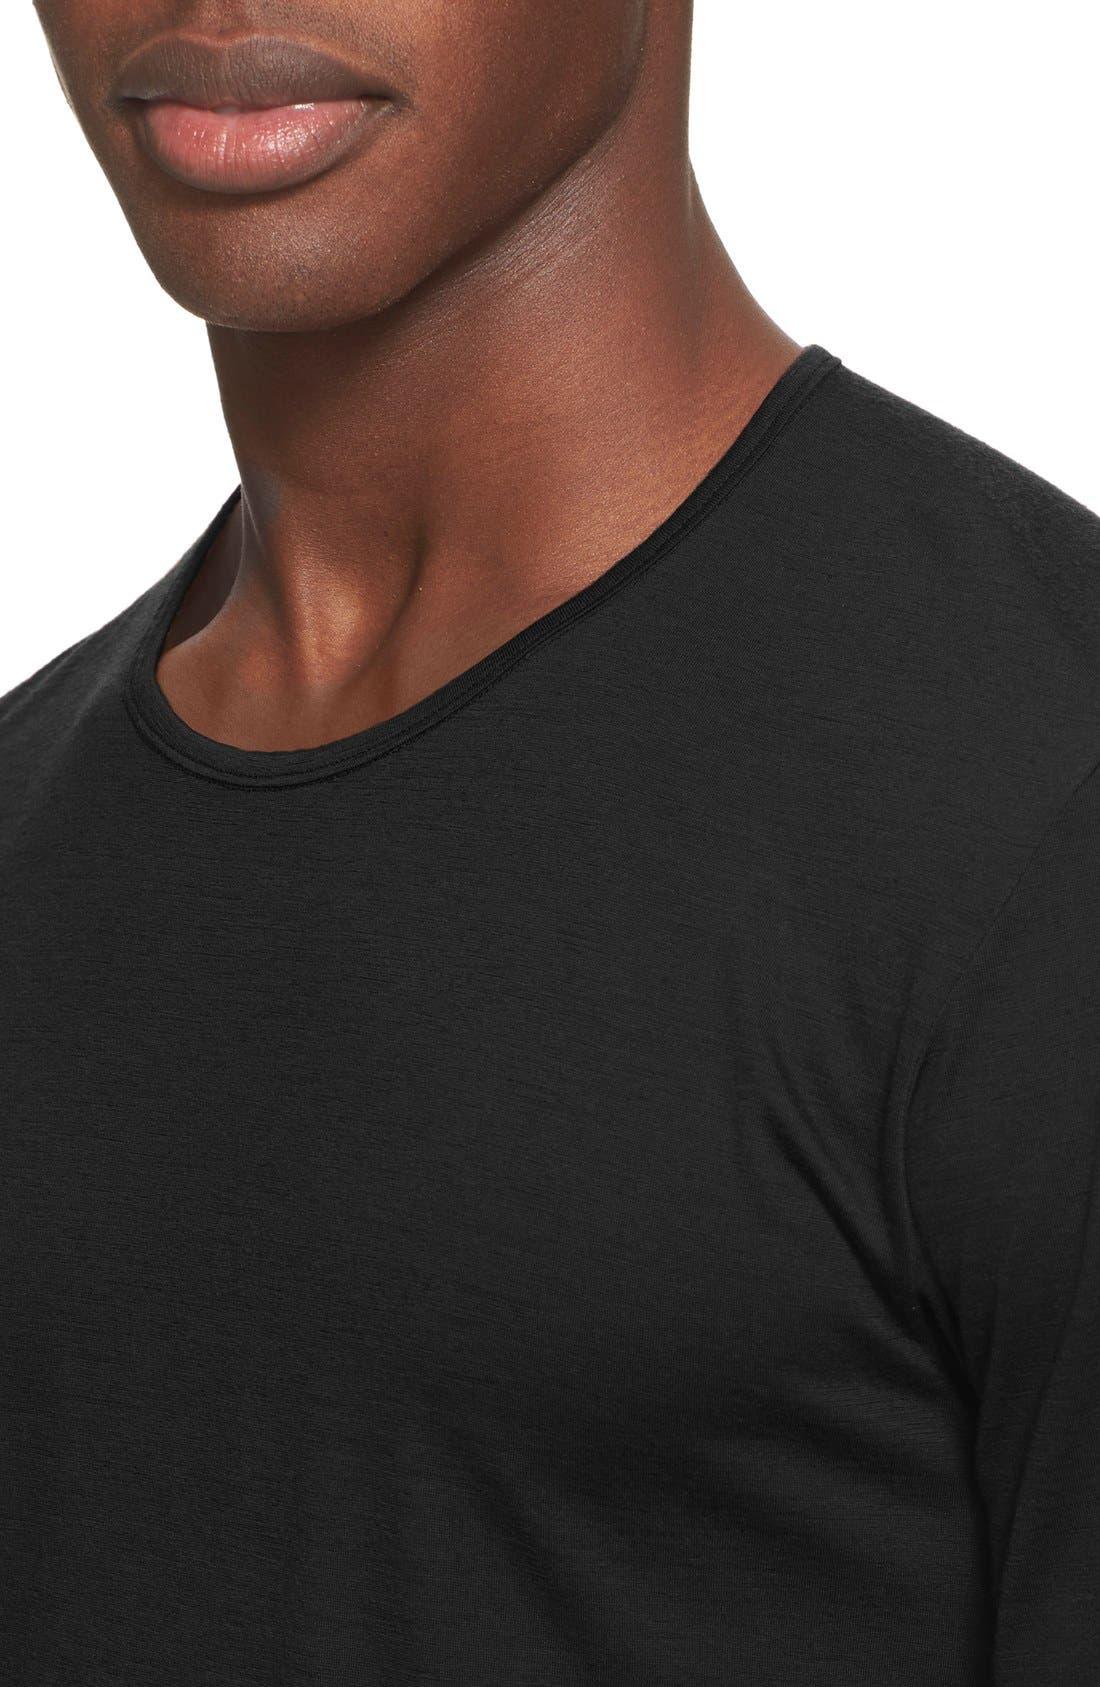 ARC'TERYX VEILANCE,                             'Frame' Merino Wool T-Shirt,                             Alternate thumbnail 4, color,                             001